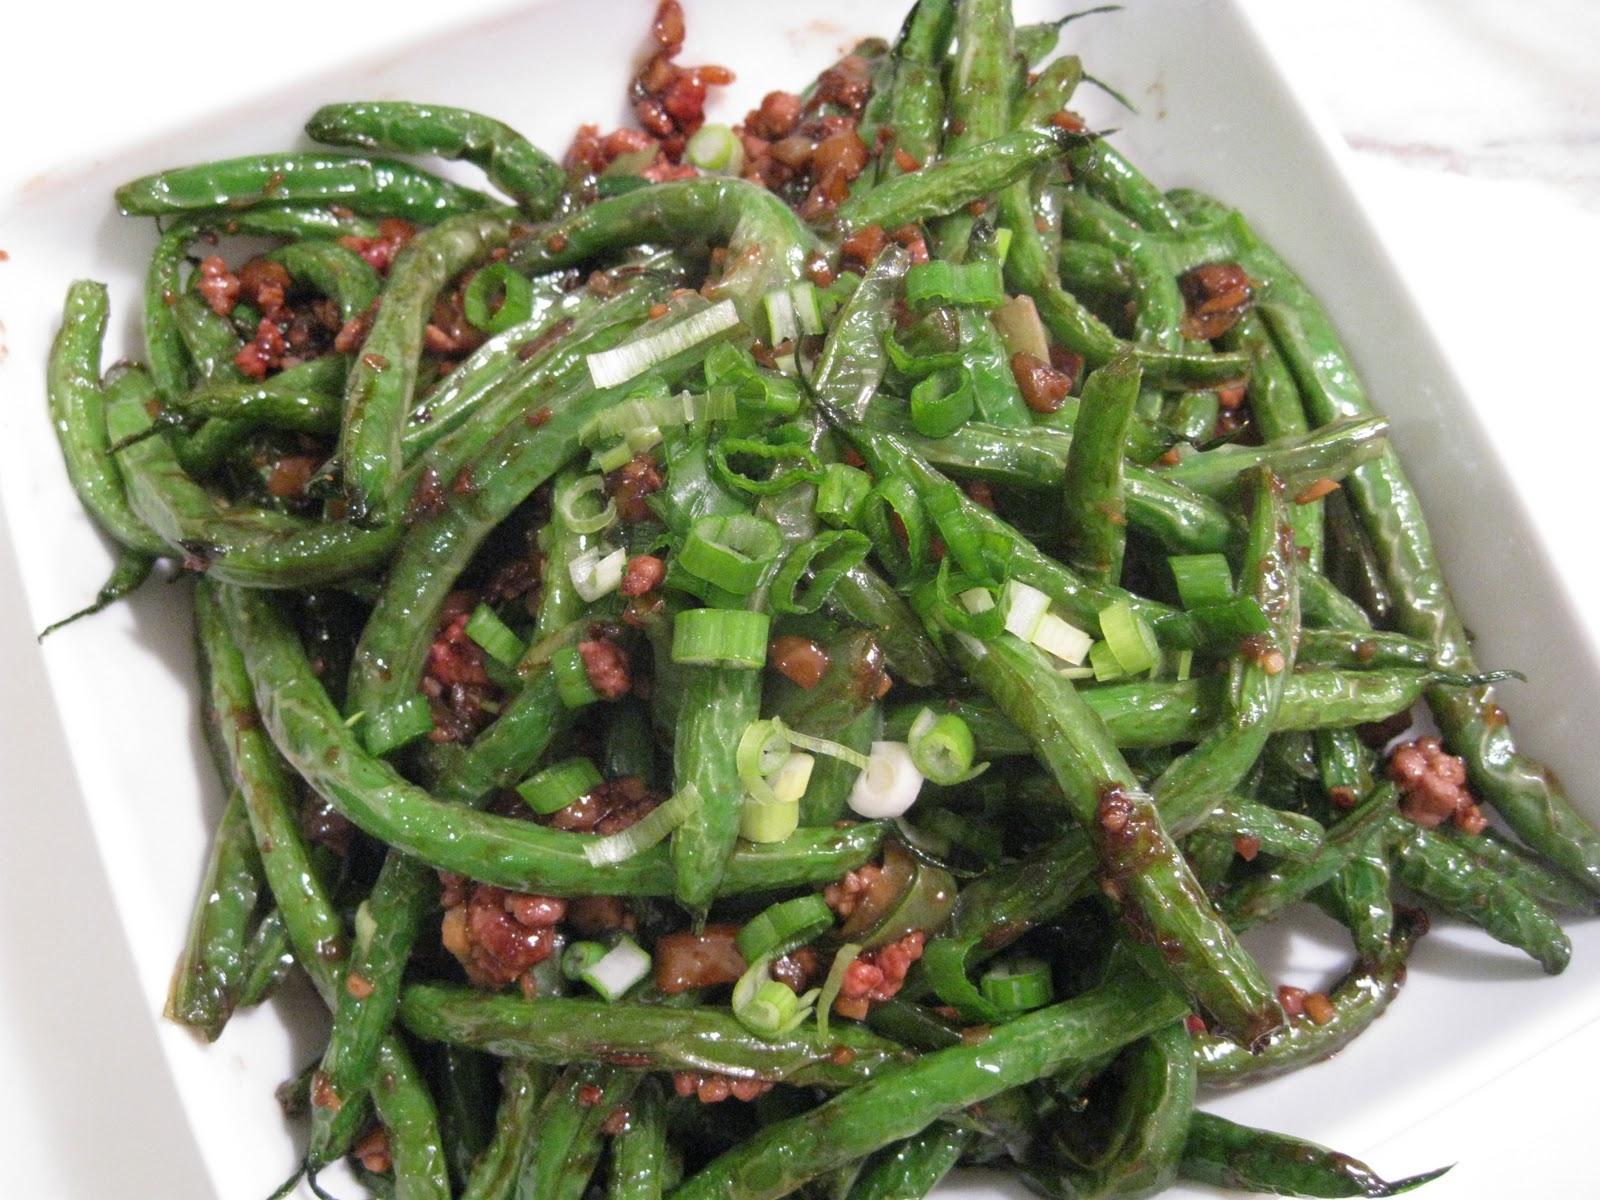 sliced green beans - HD1600×1200